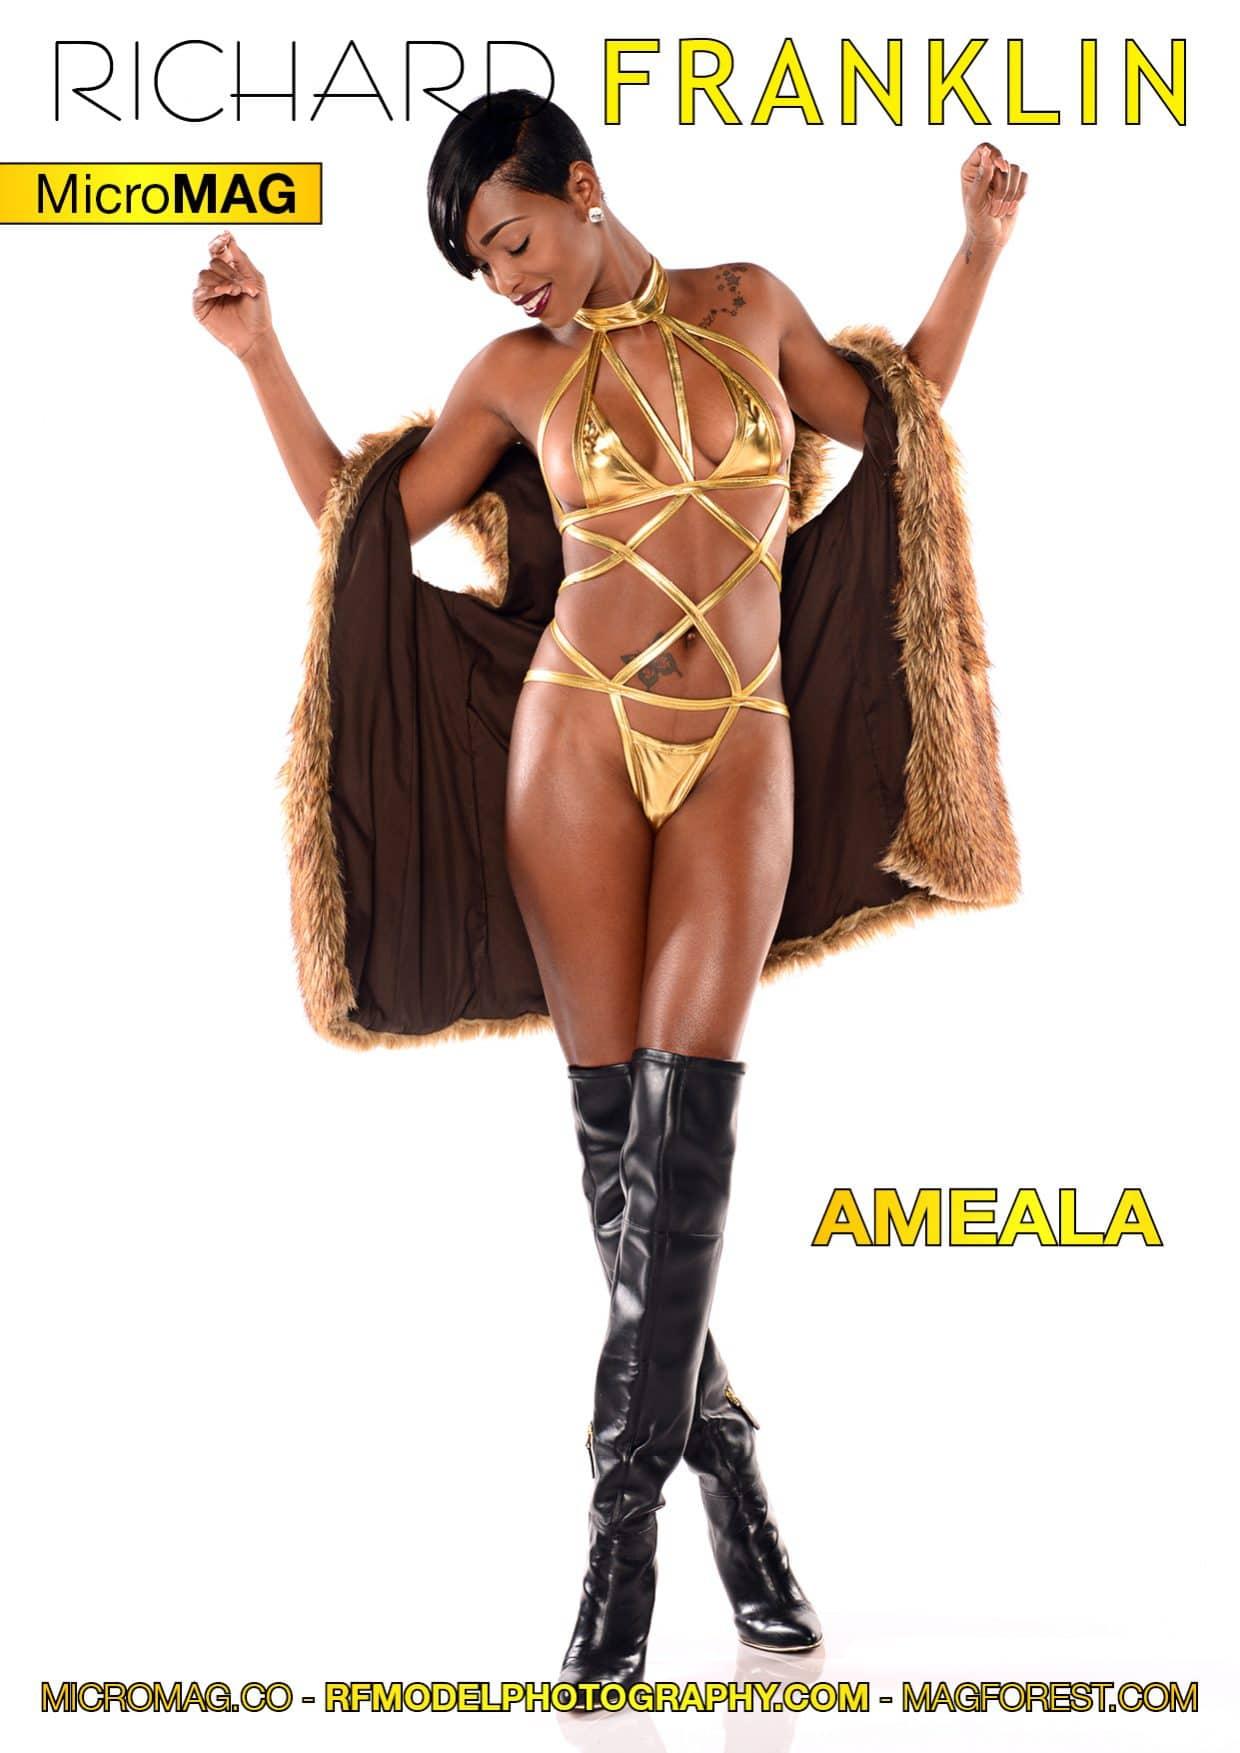 Richard Franklin Micromag – Ameala – Issue 2